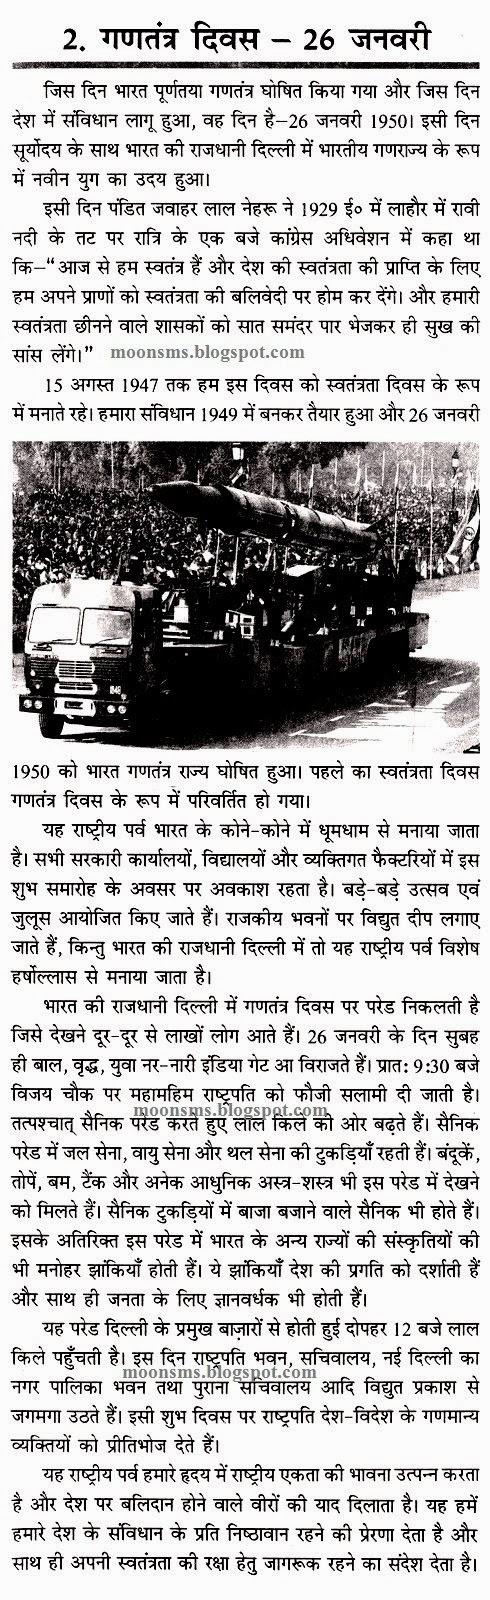 Republic Day 26 January speech in Hindi गणतंत्र दिवस भाषण